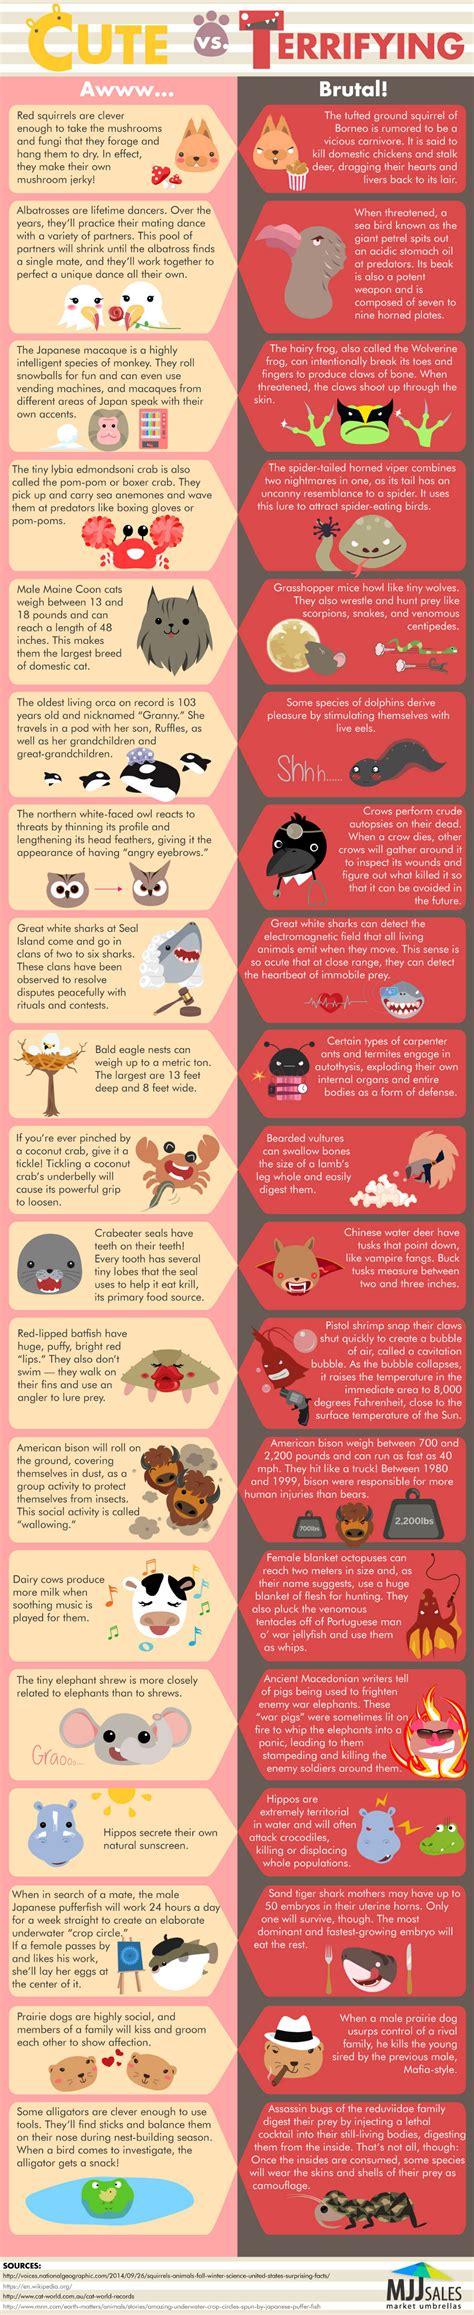 infographics animal kingdom 1848776543 adorable and horrifying animal facts infographic animals animal facts animals facts